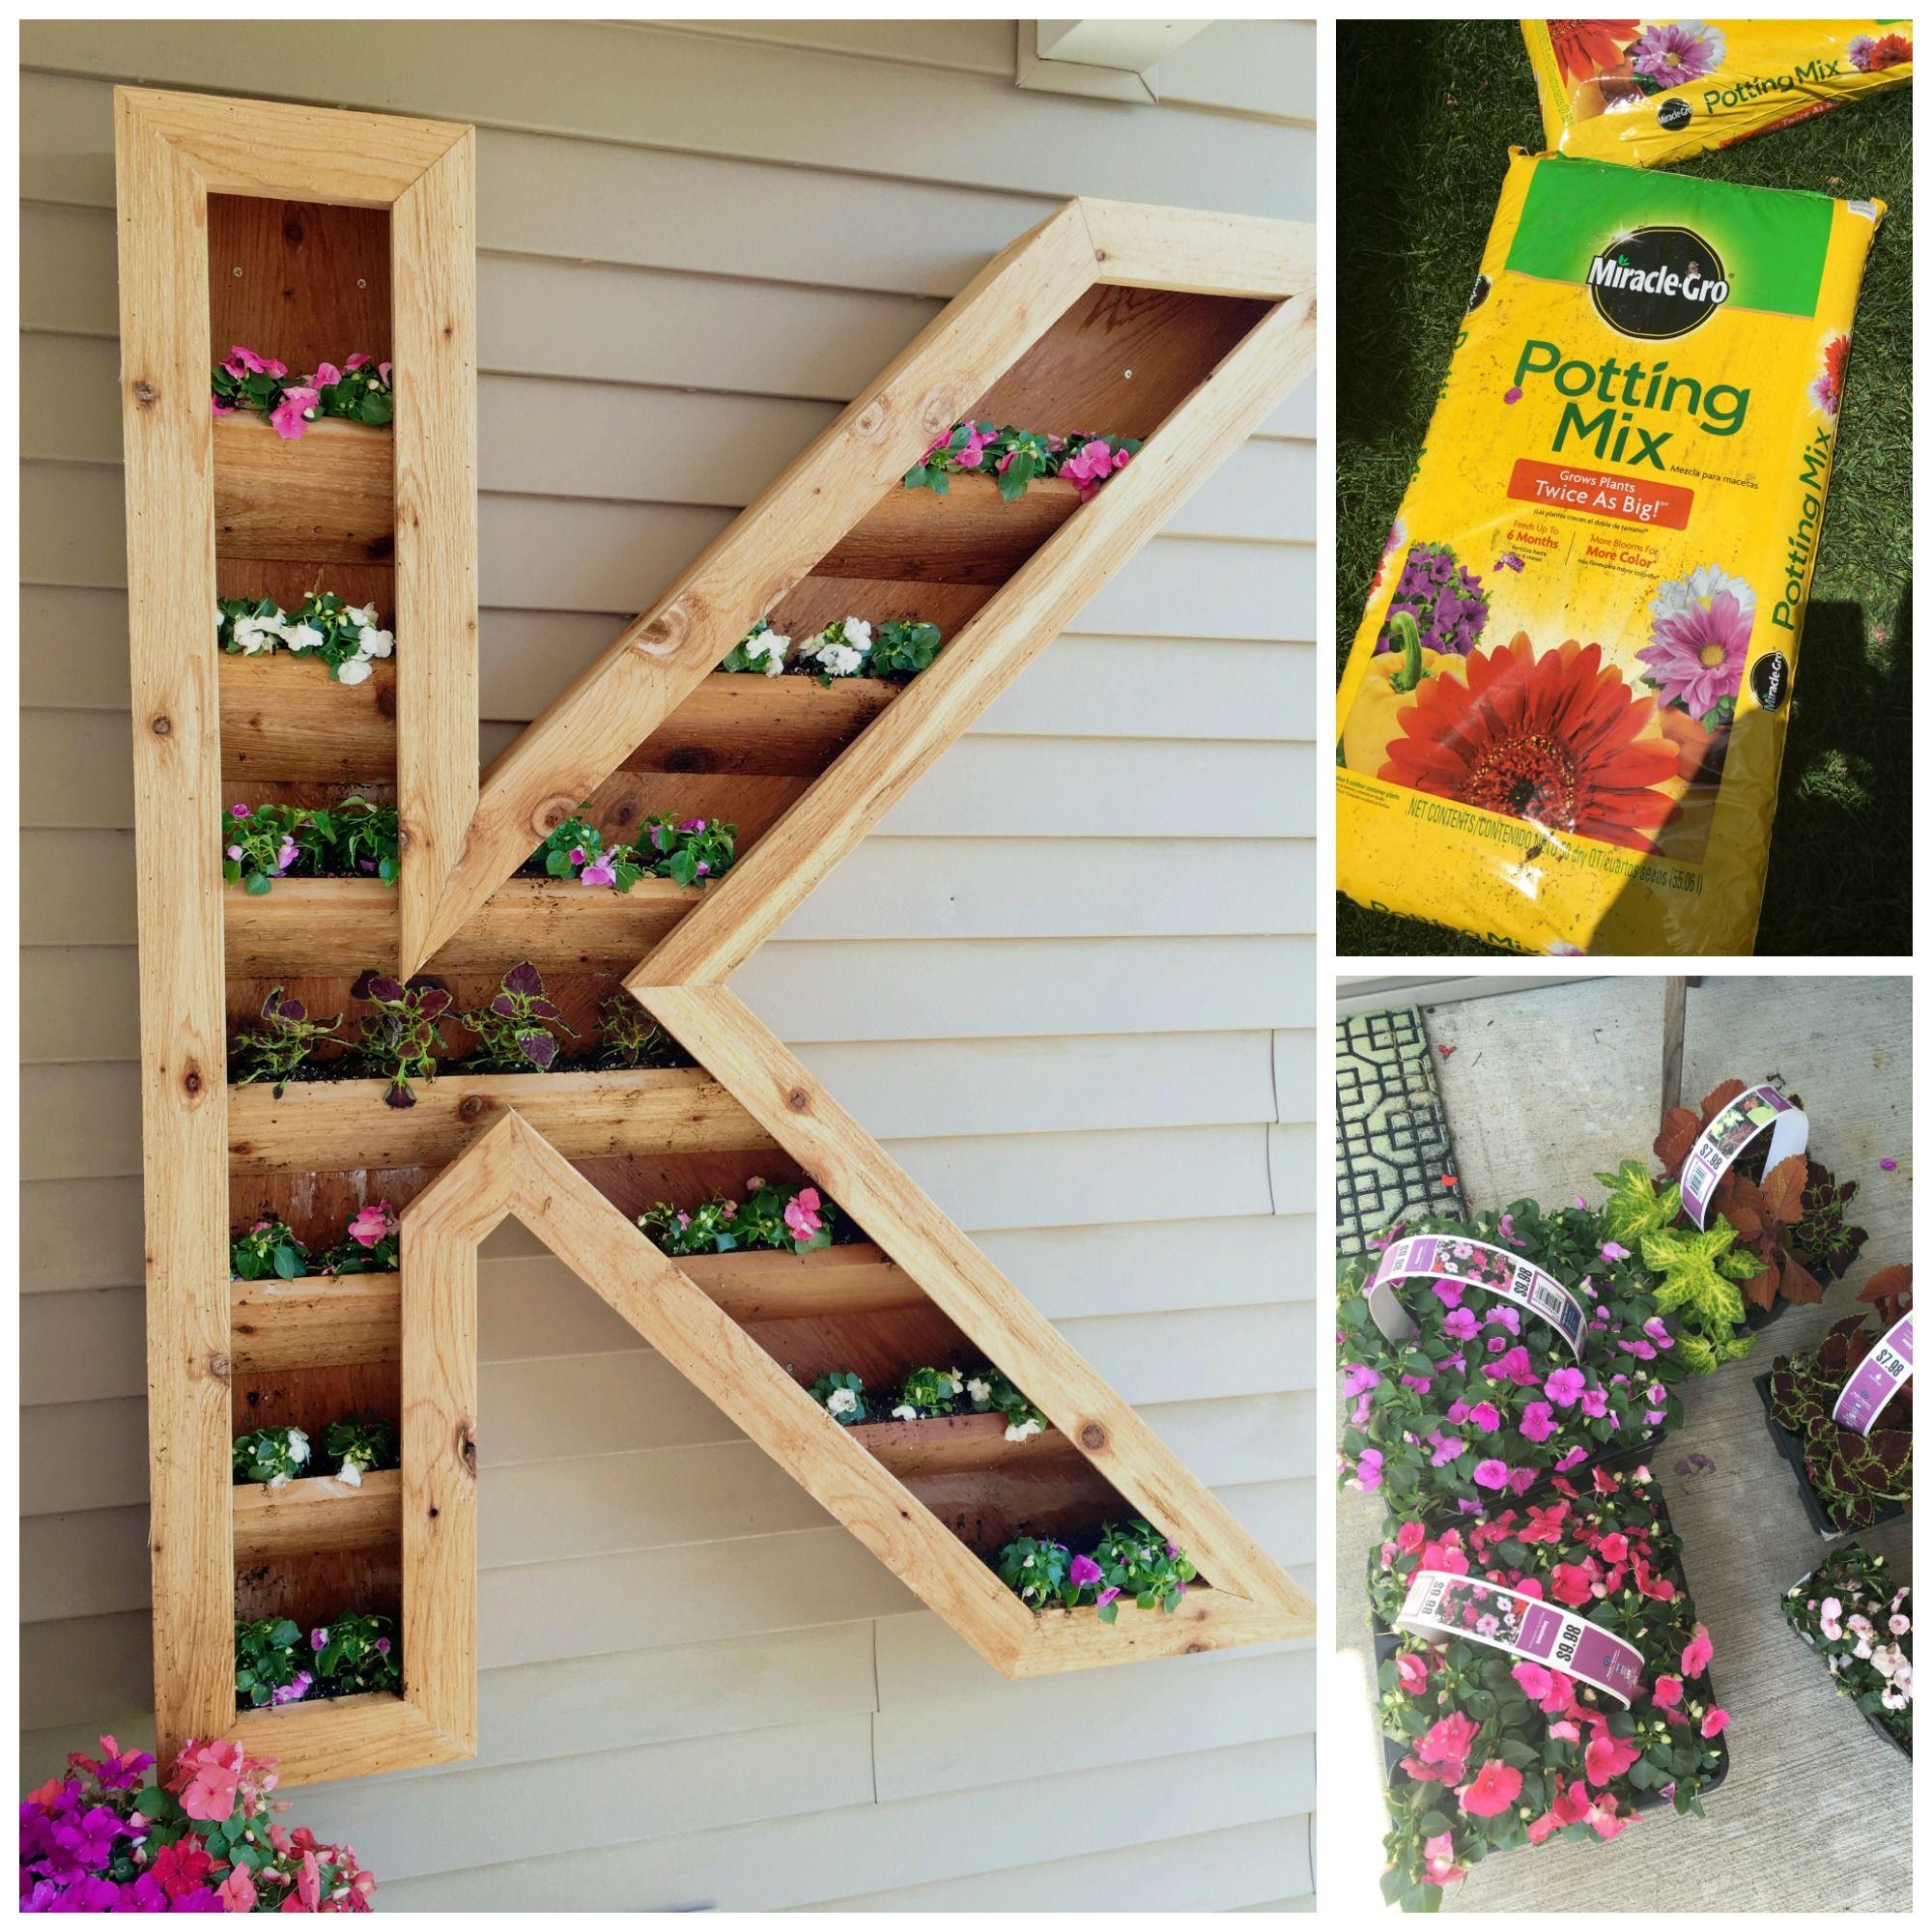 DIY Cedar Monogram Planter Box | DIY | Planter boxes, Diy monogram